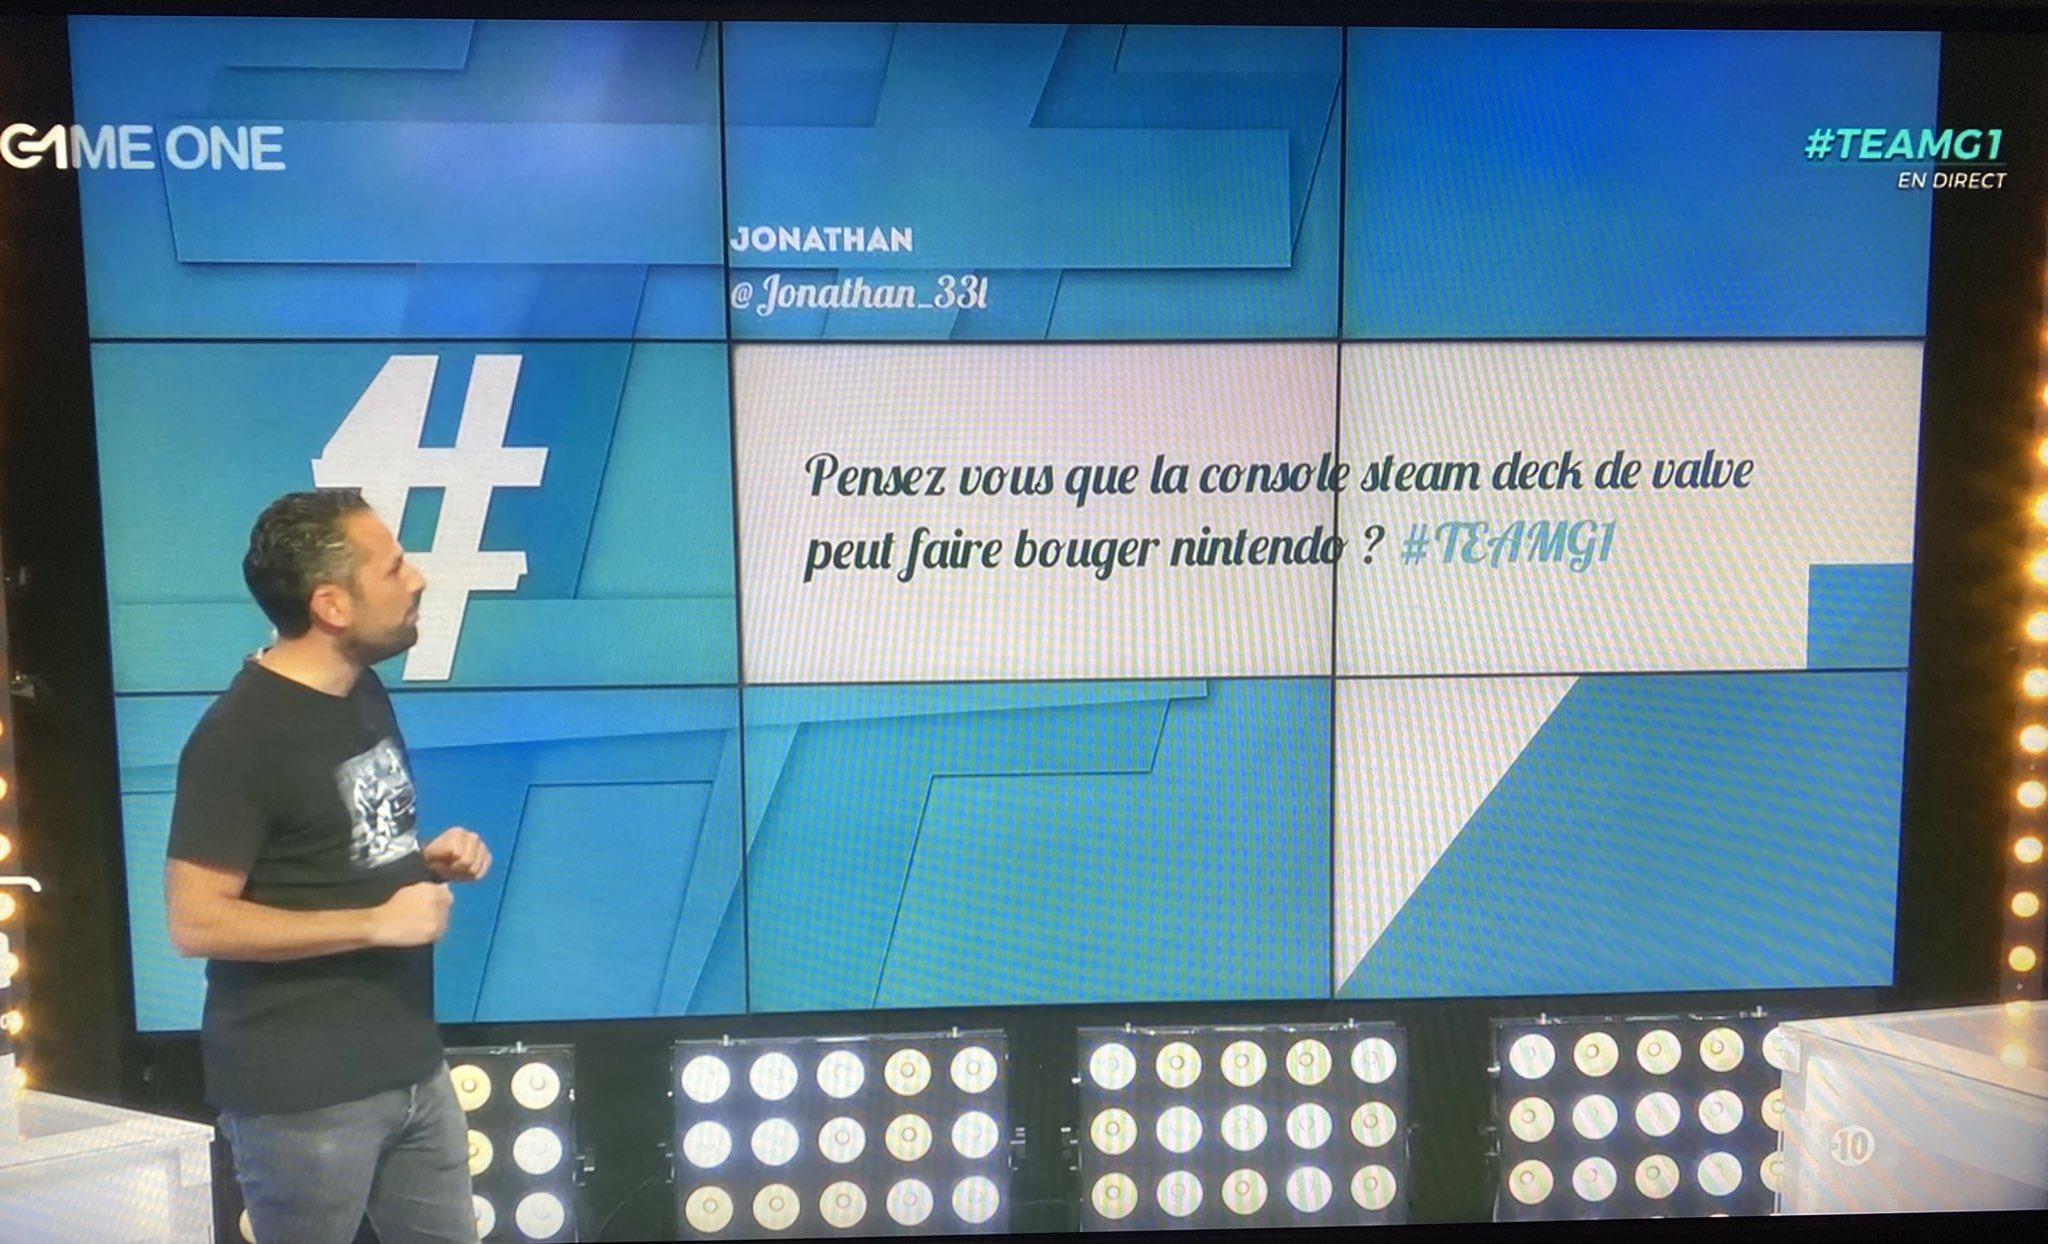 #TEAMG1 Twitter